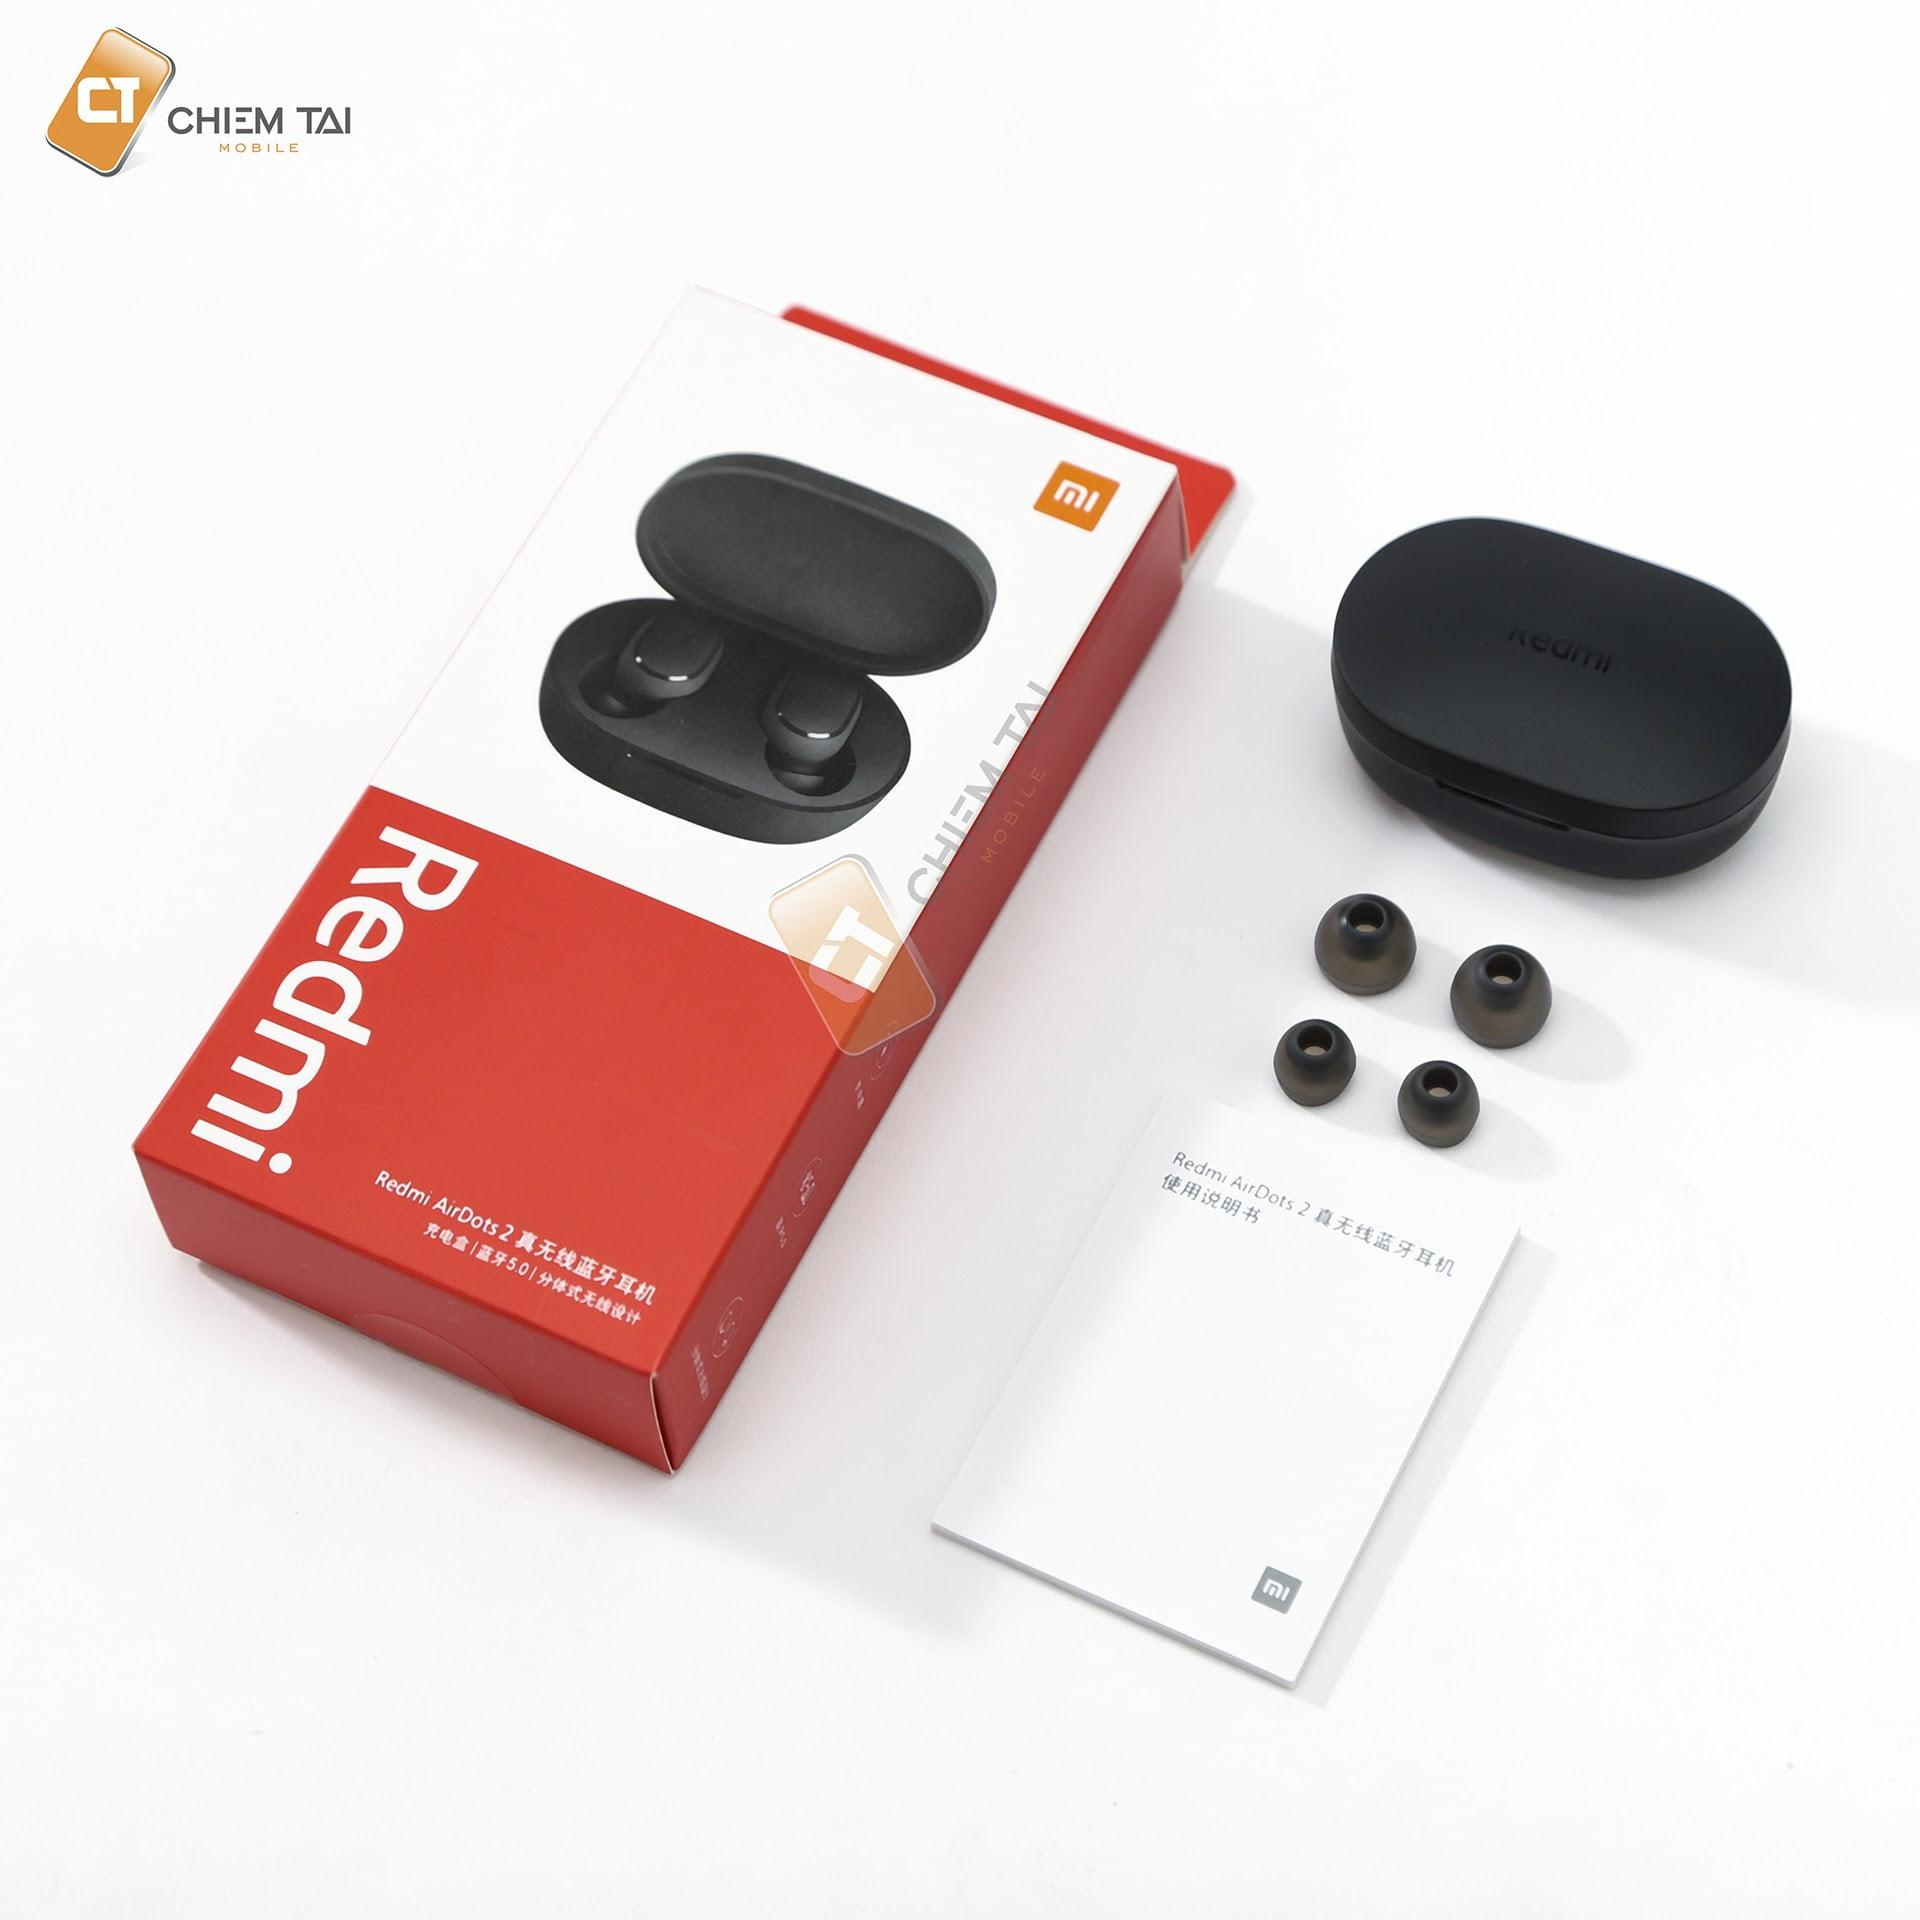 tai nghe bluetooth true wireless redmi airdots 2 605063c0e1433